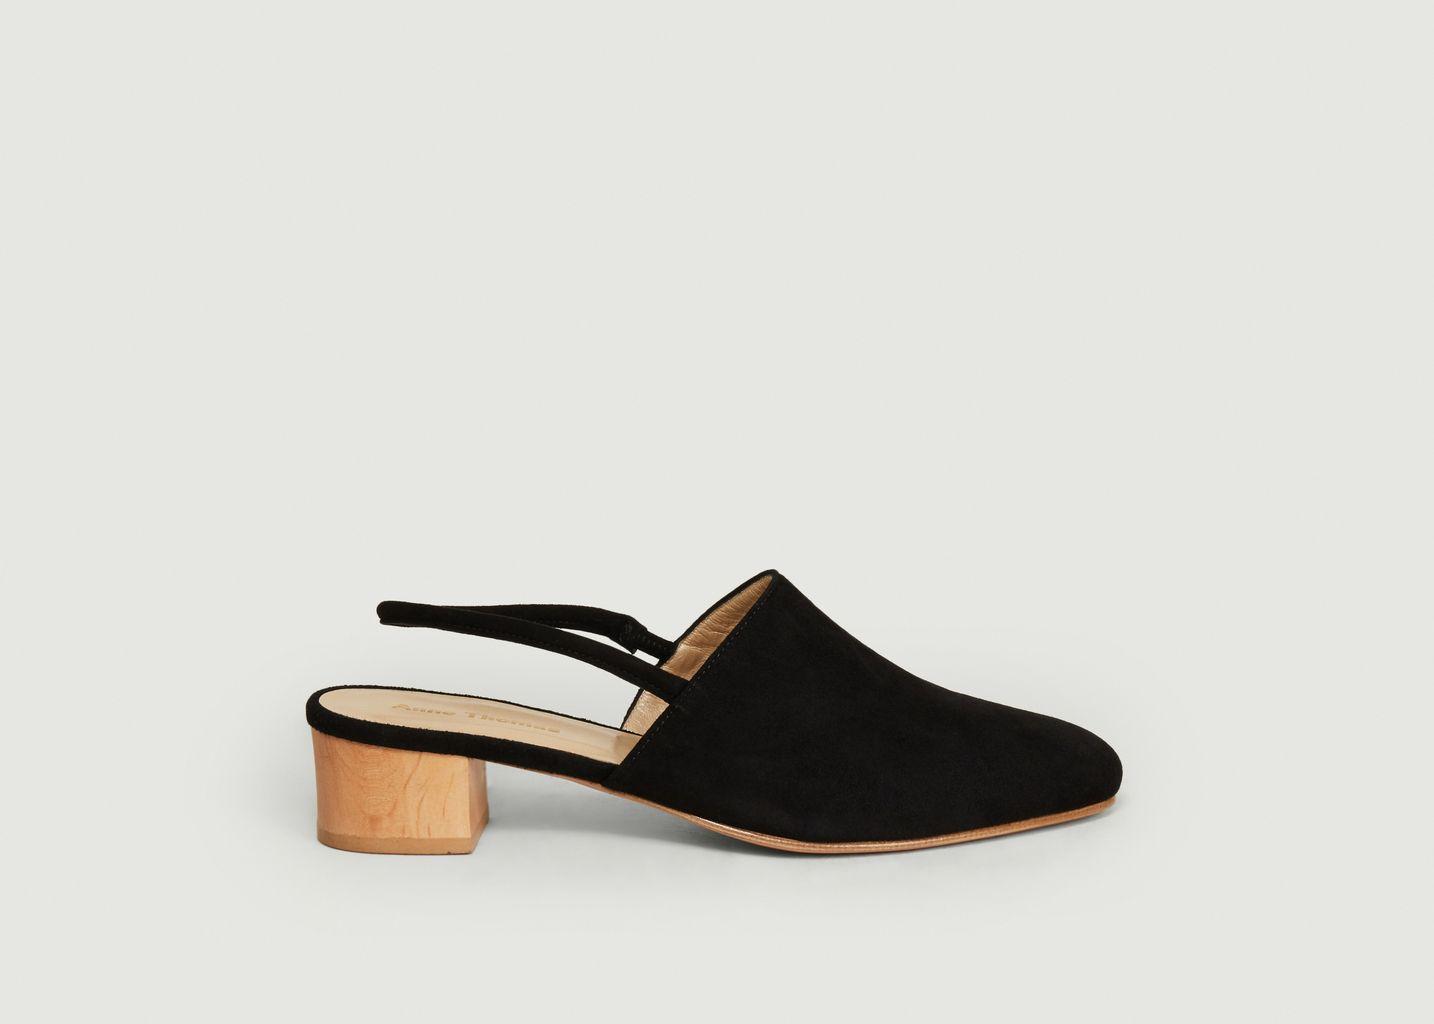 Sandales Williamsburg - Anne Thomas Chaussures